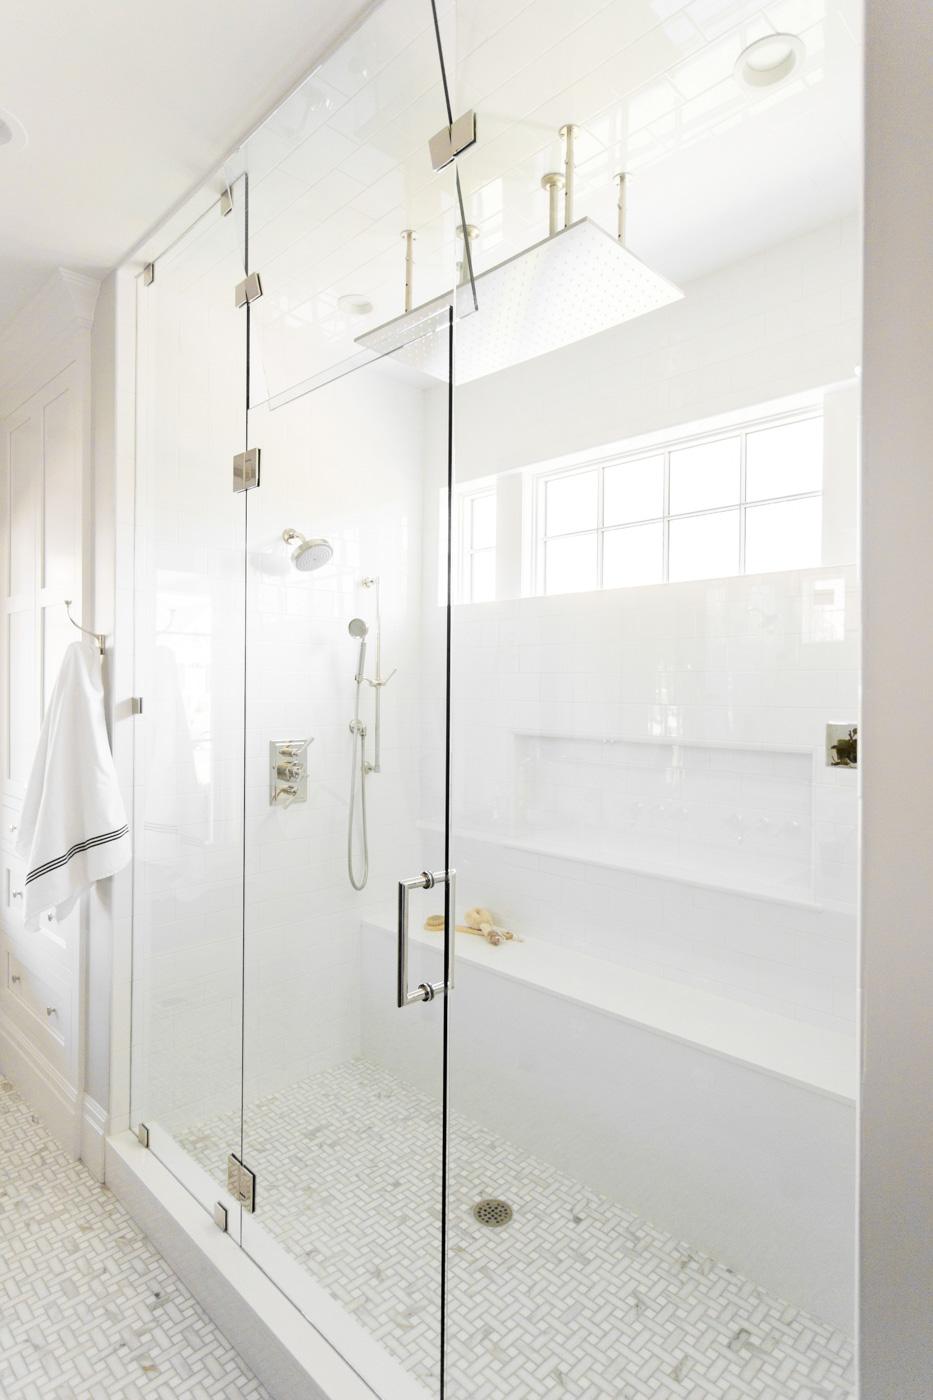 Shower+details+__+Studio+McGee.jpg